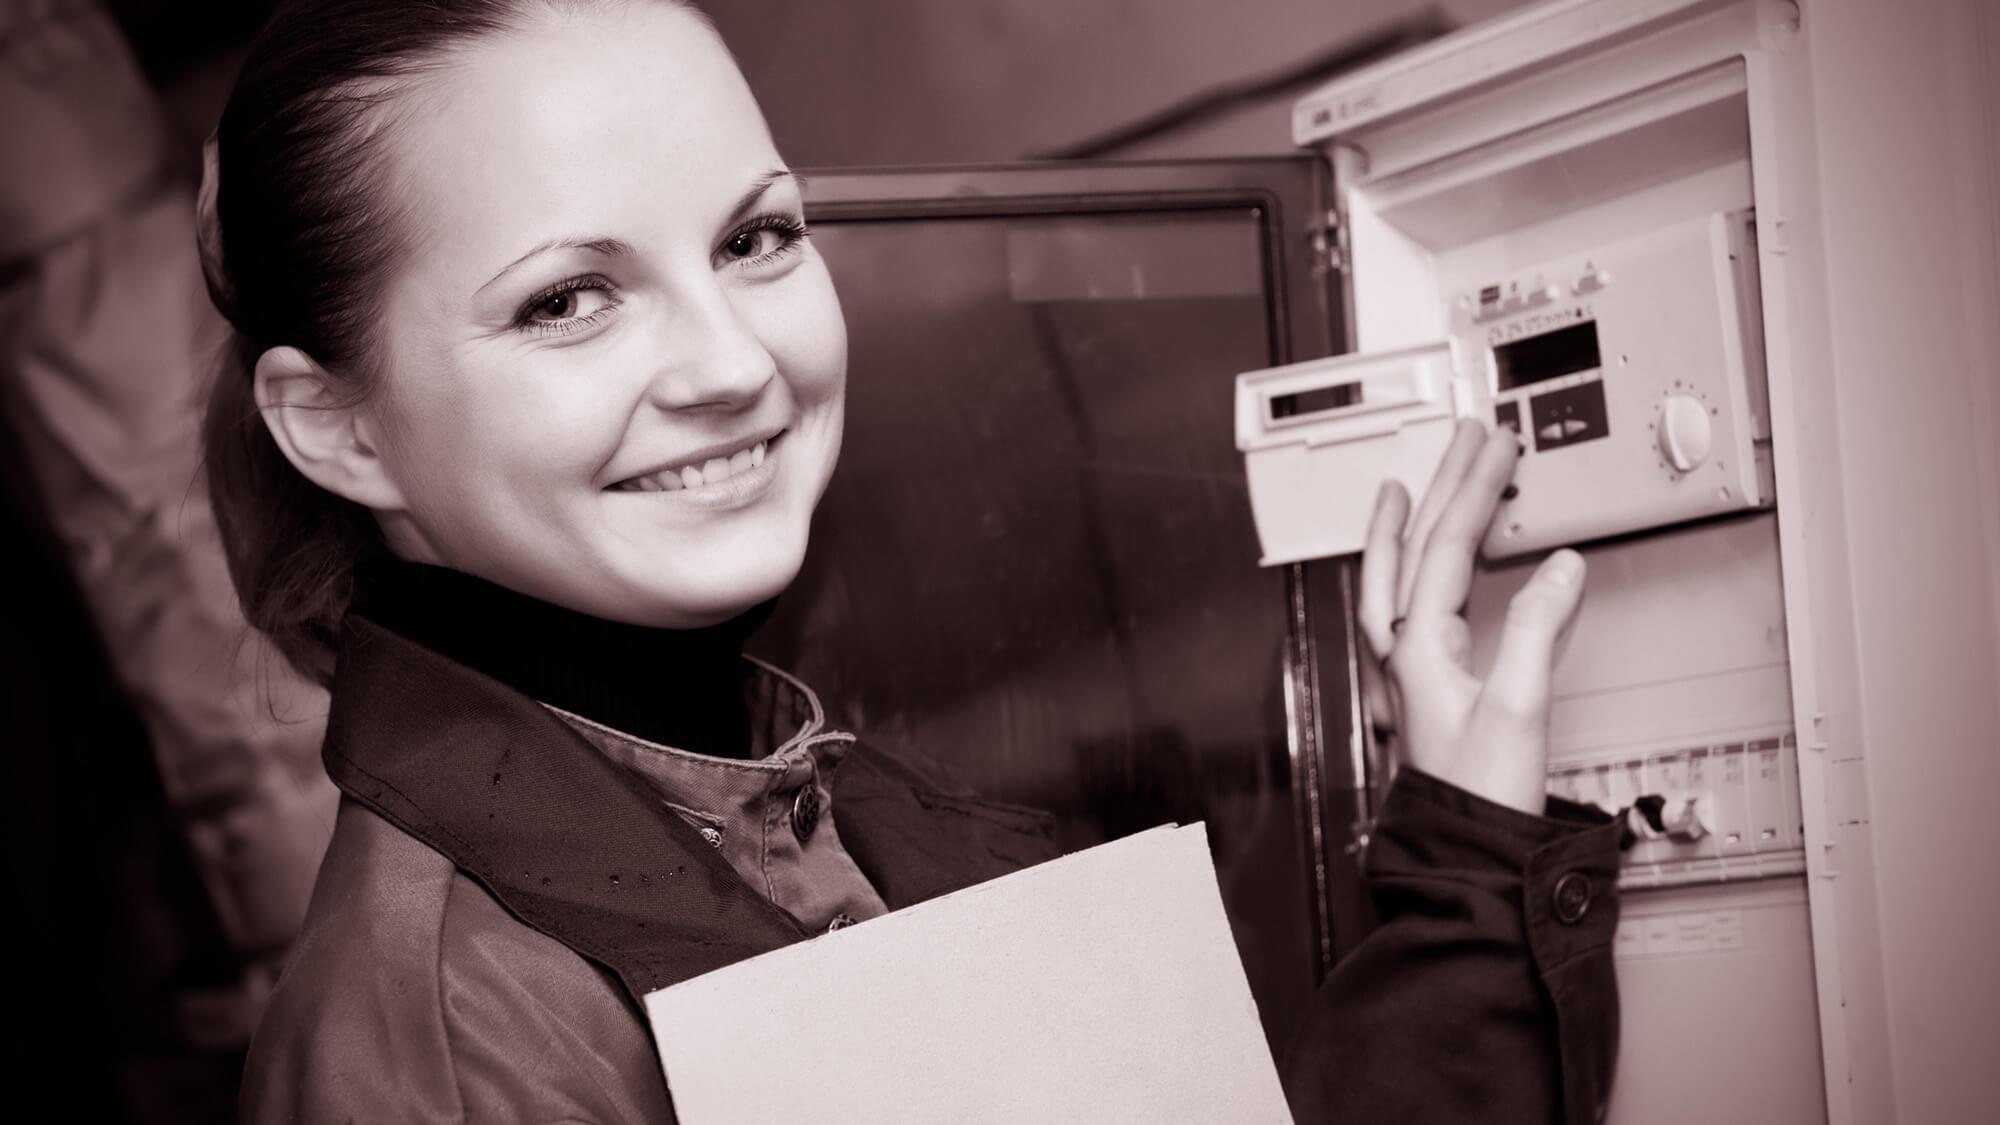 Boiler Room Monitoring